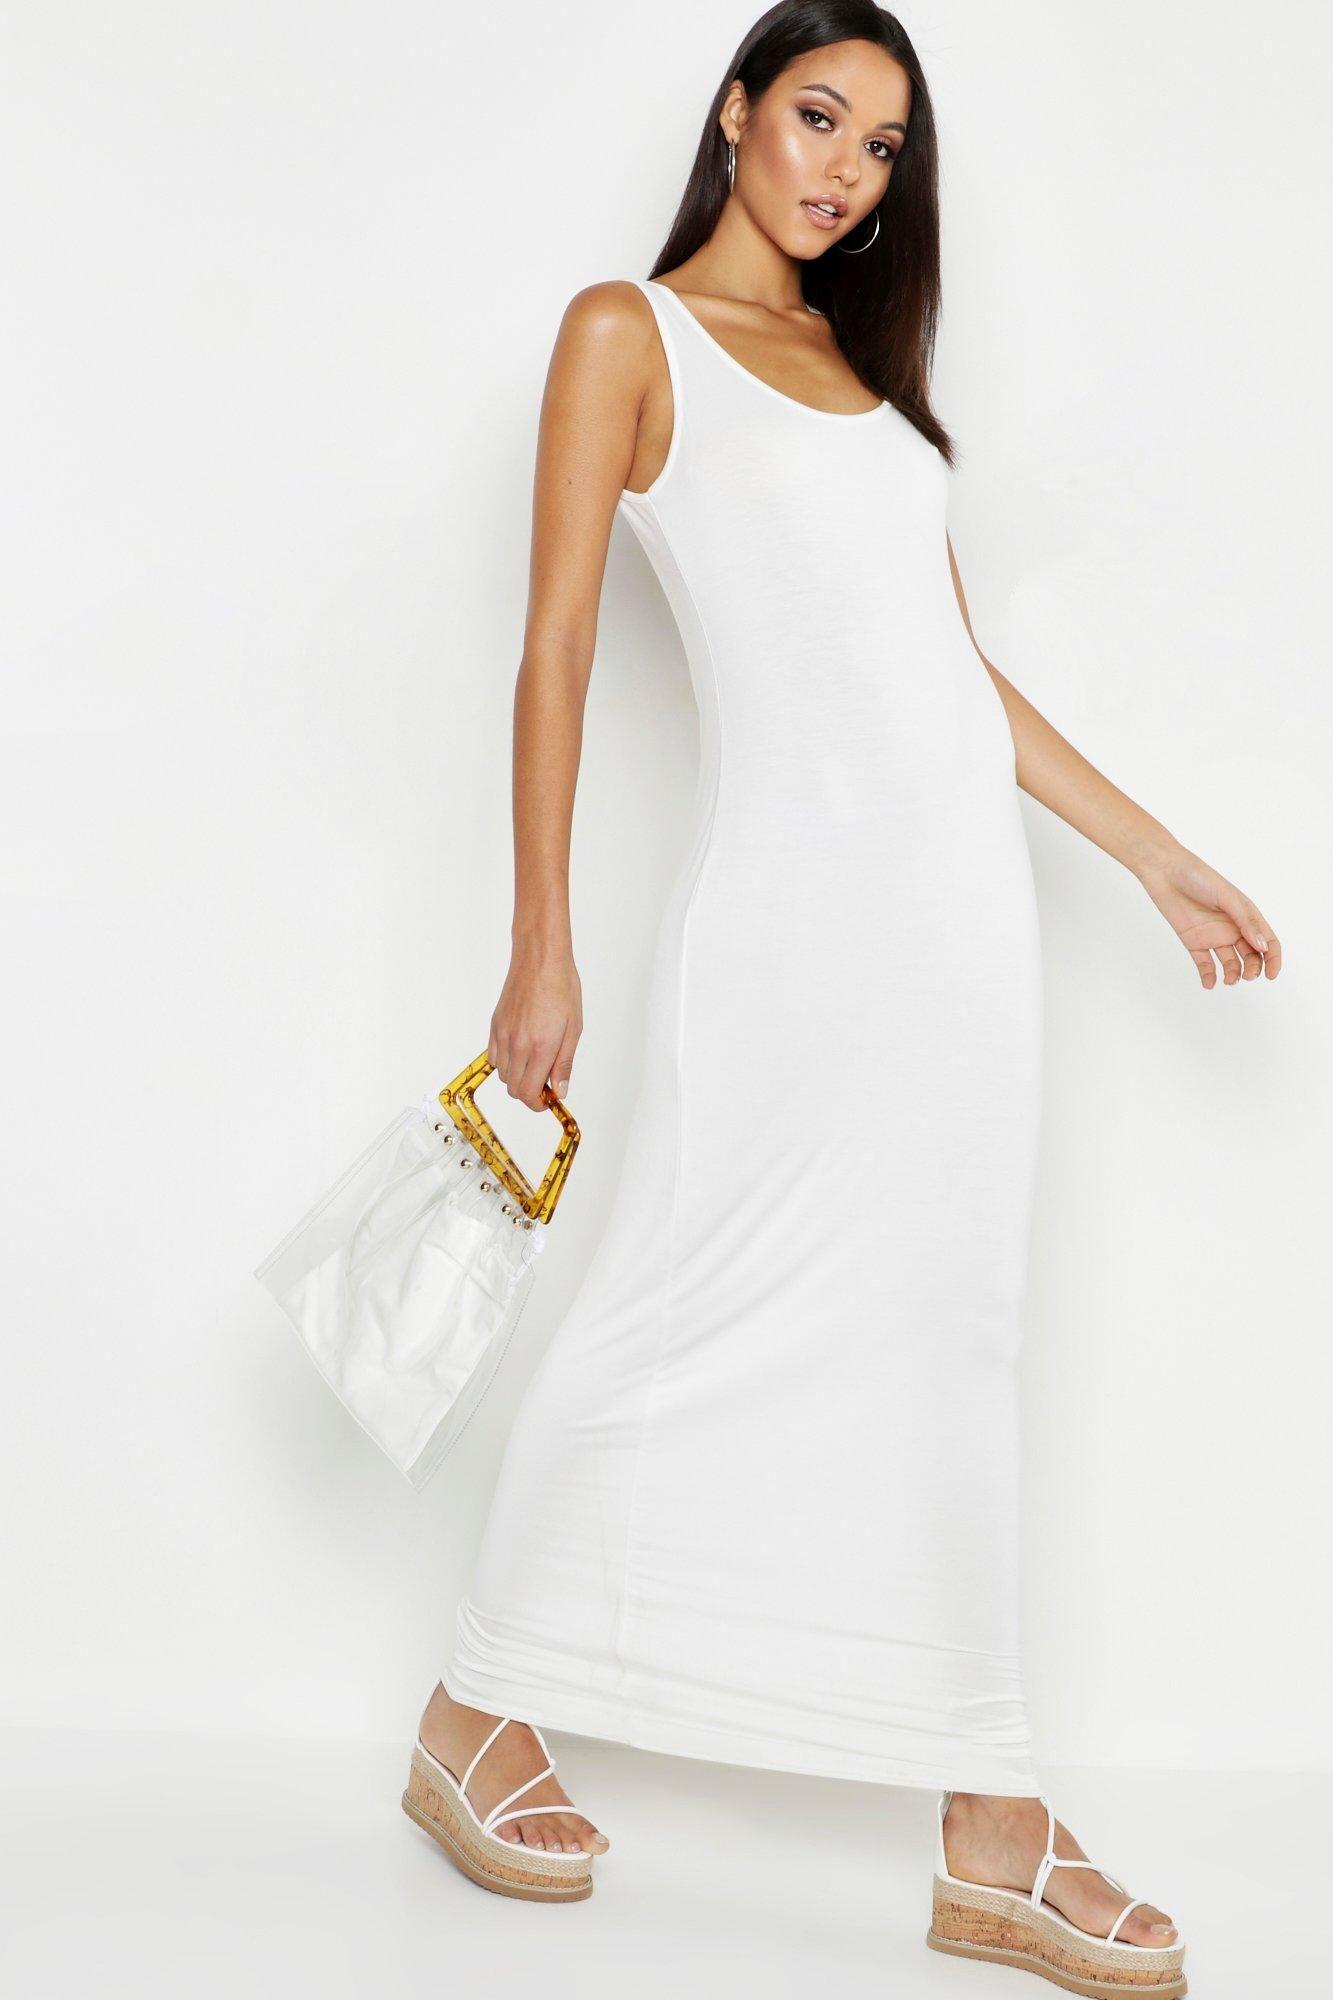 Tall Basic Maxi Dress Boohoo In 2021 Basic Maxi Dress Tall Maxi Dress White Maxi Dresses [ 2000 x 1333 Pixel ]